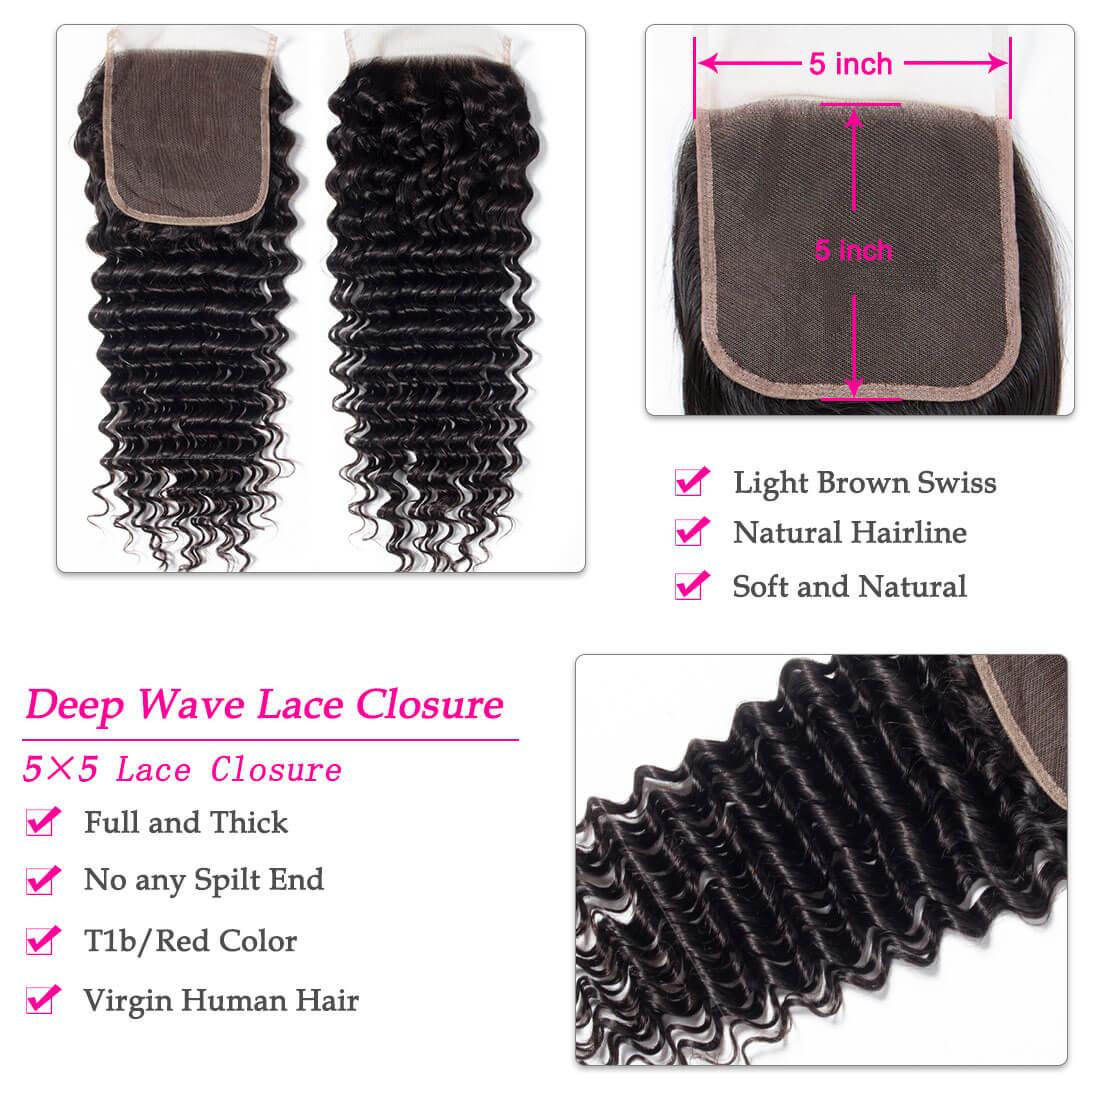 5×5 deep closure,5×5 deep hair closure,deep wave closure,5×5 lace closure,Brazilian deep wave closure,cheap deep wave closure,human deep wave closure,Remy deep wave closure,vigin deep wave closure